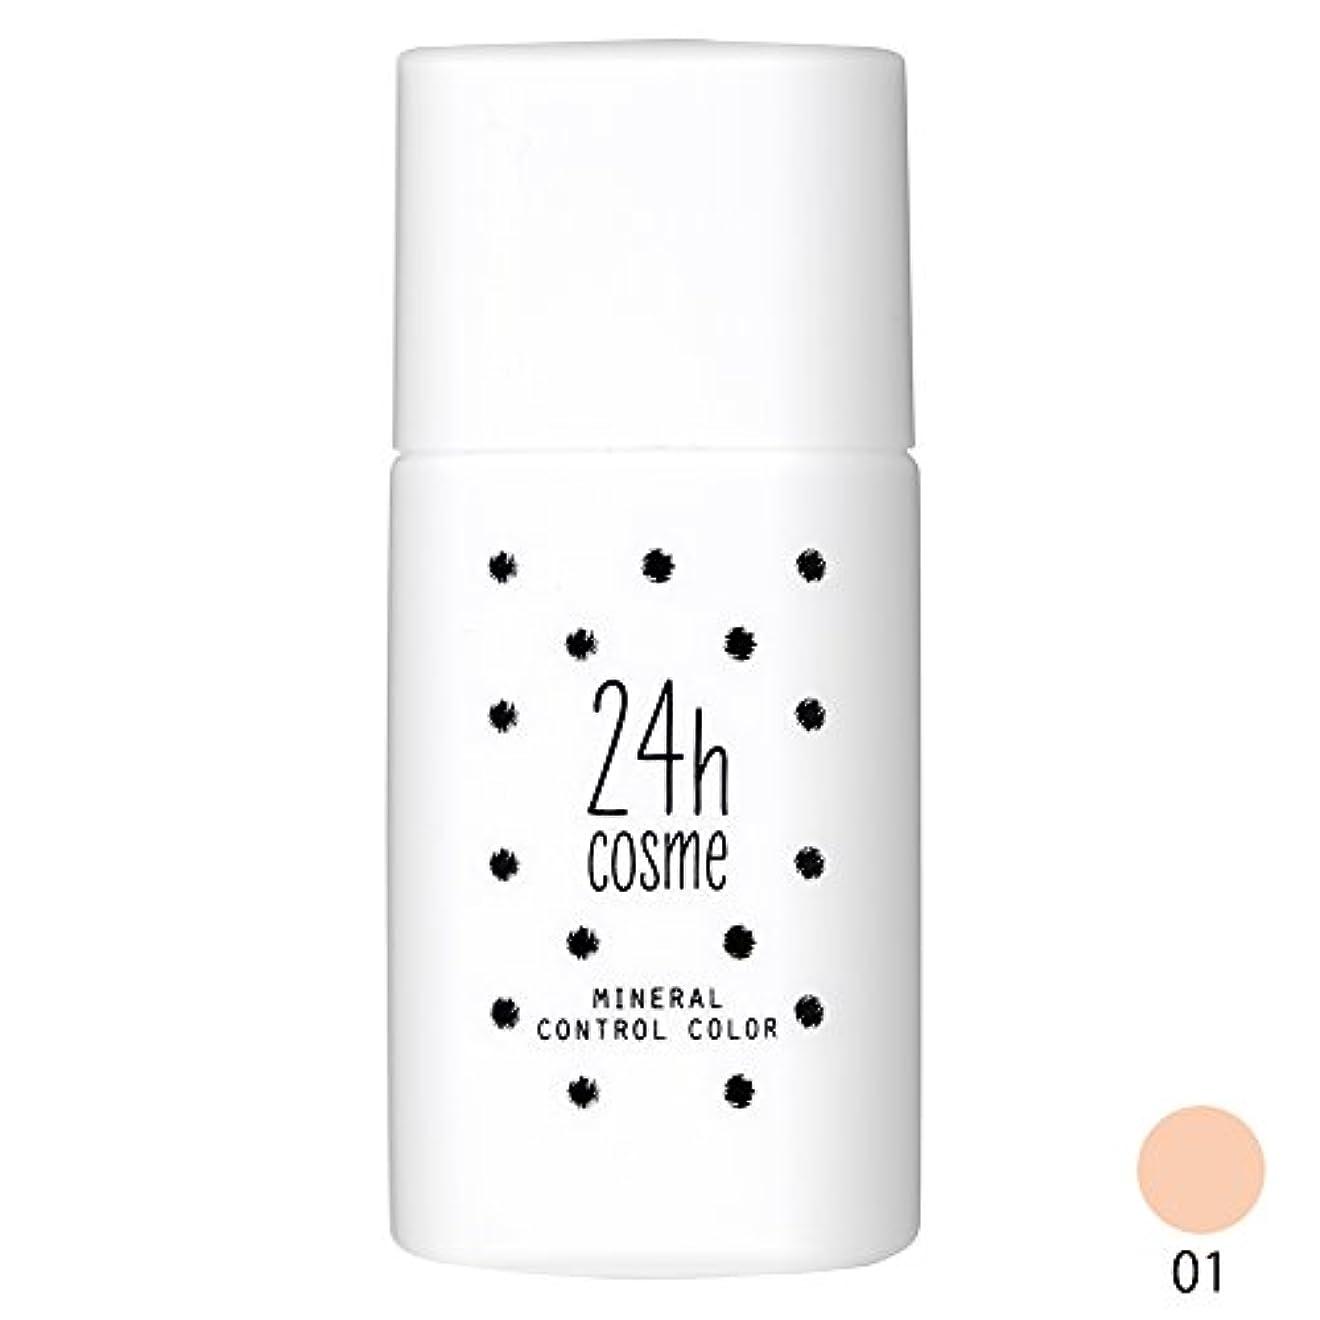 24h cosme 24 コントロールベースカラー 01ブライトピンク 肌に優しい化粧下地 20ml